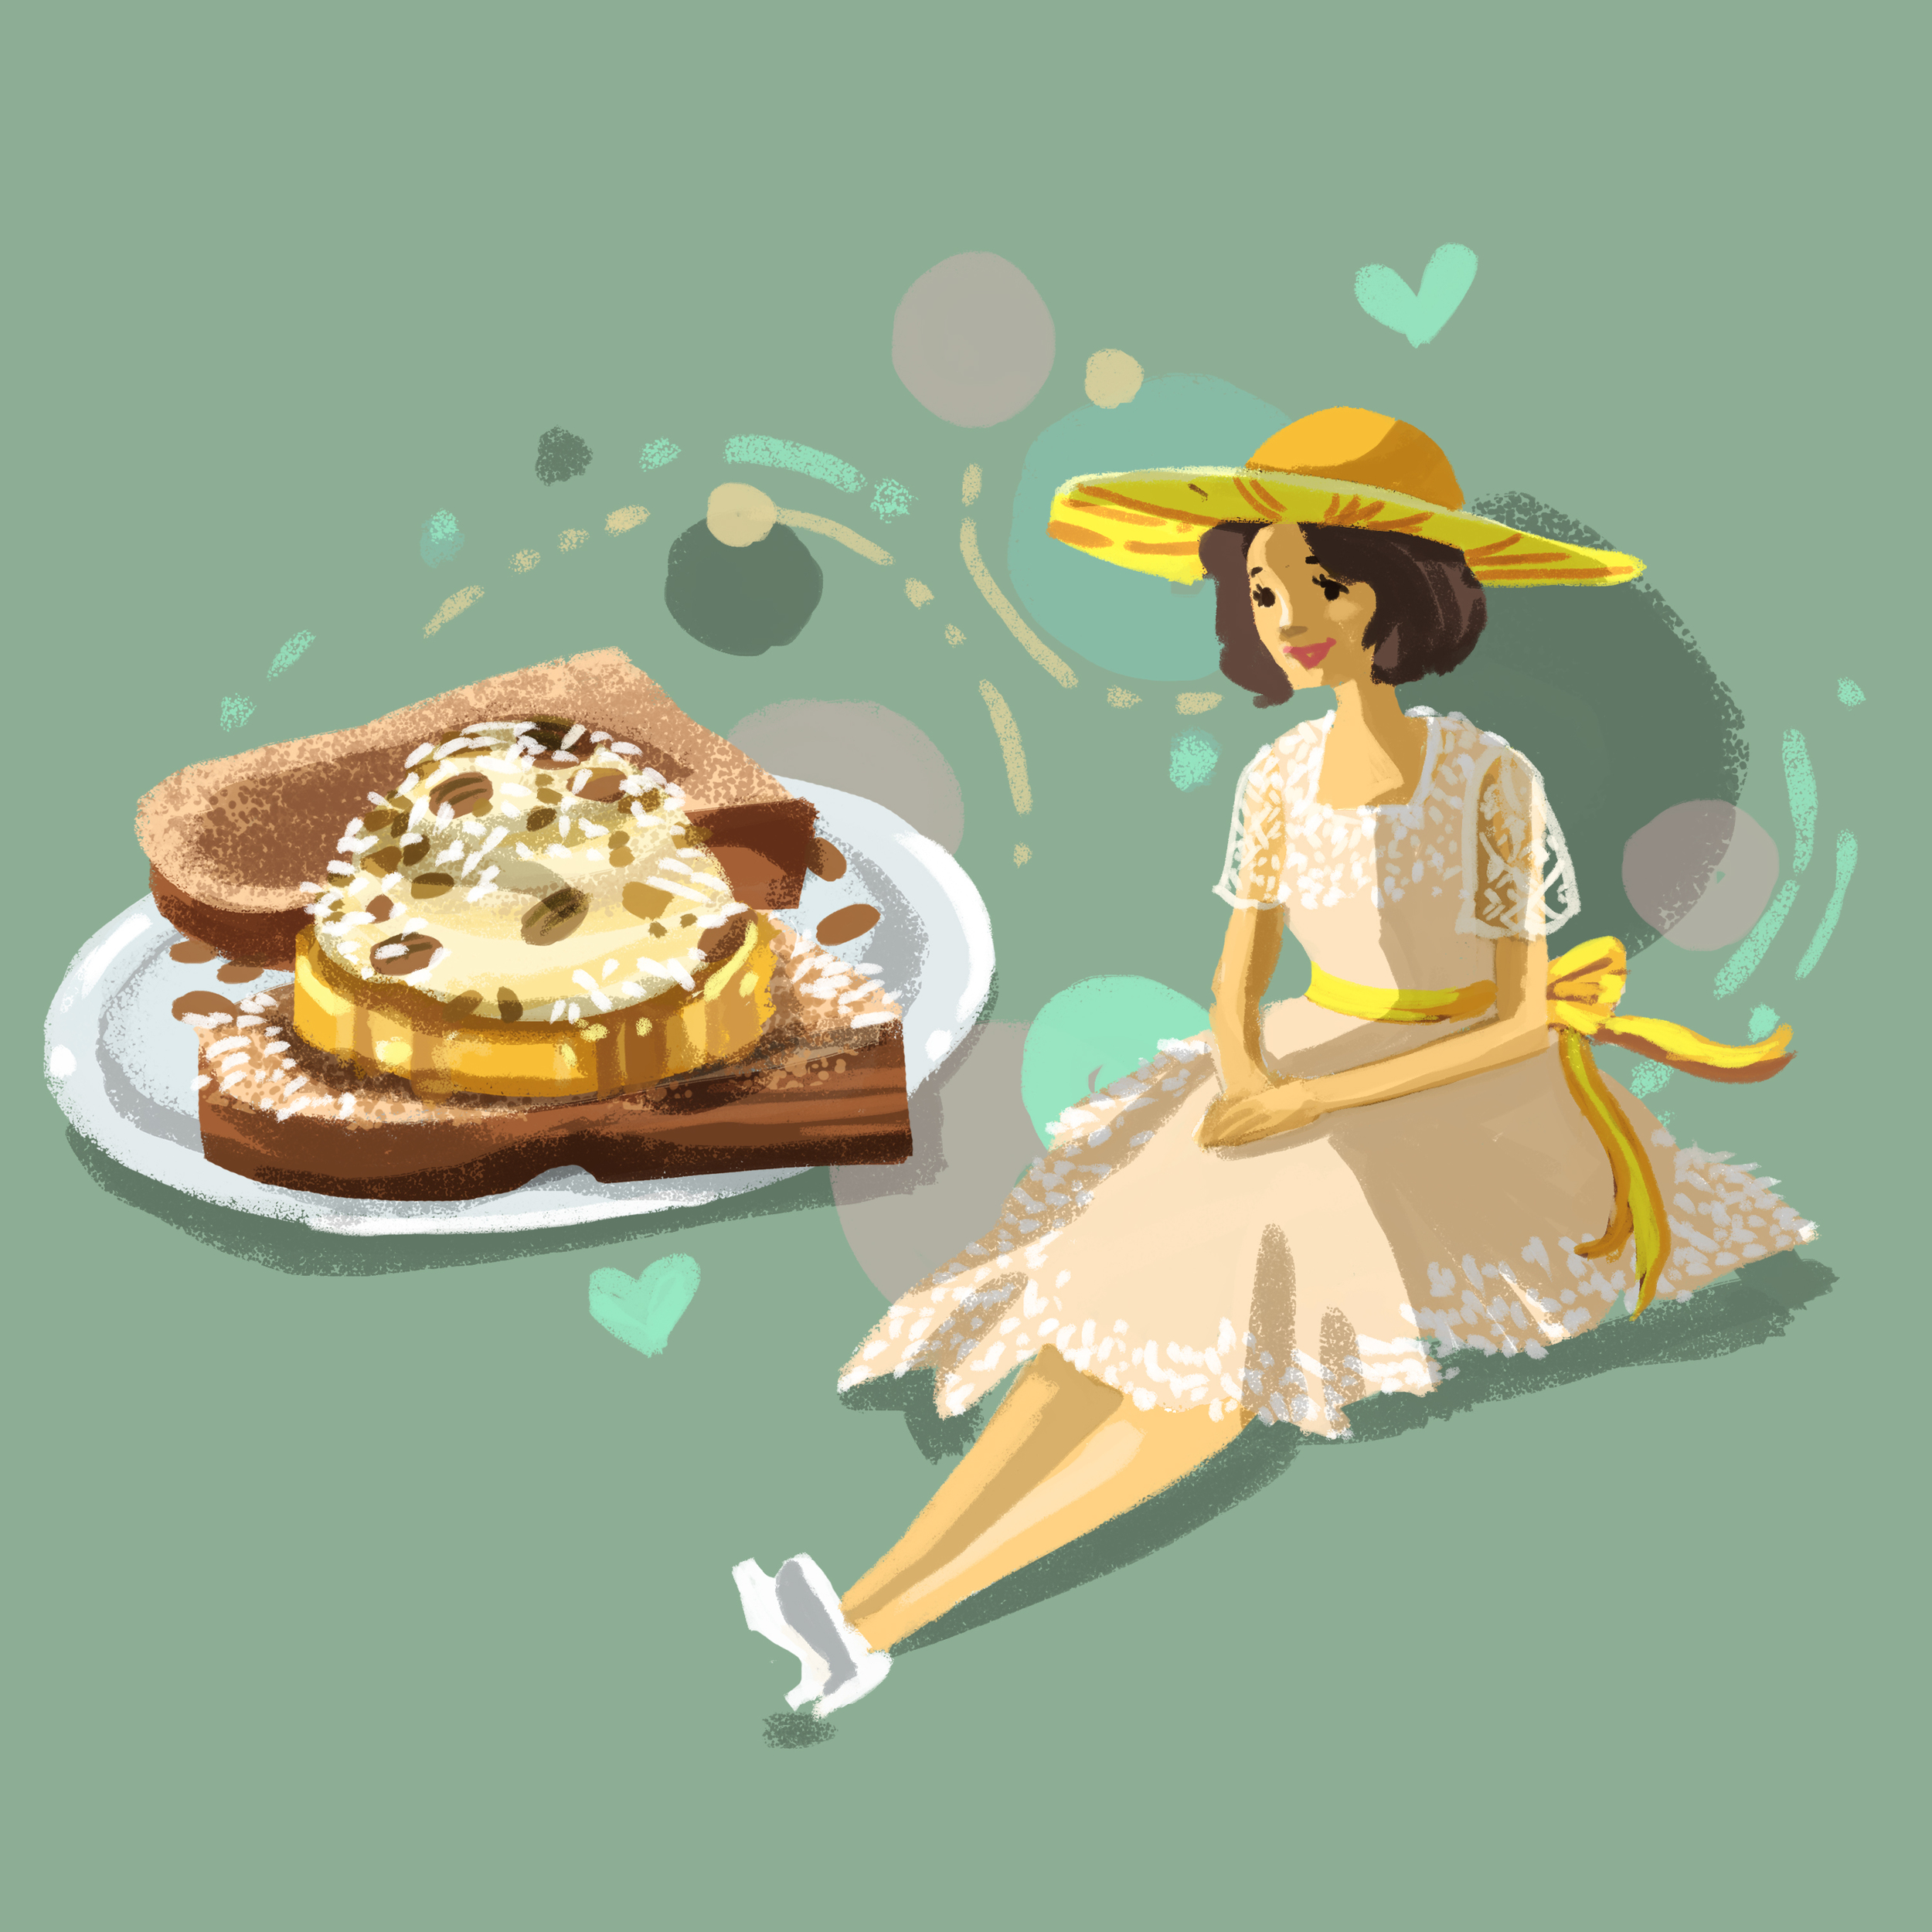 34_IceCream_sandwich.jpg